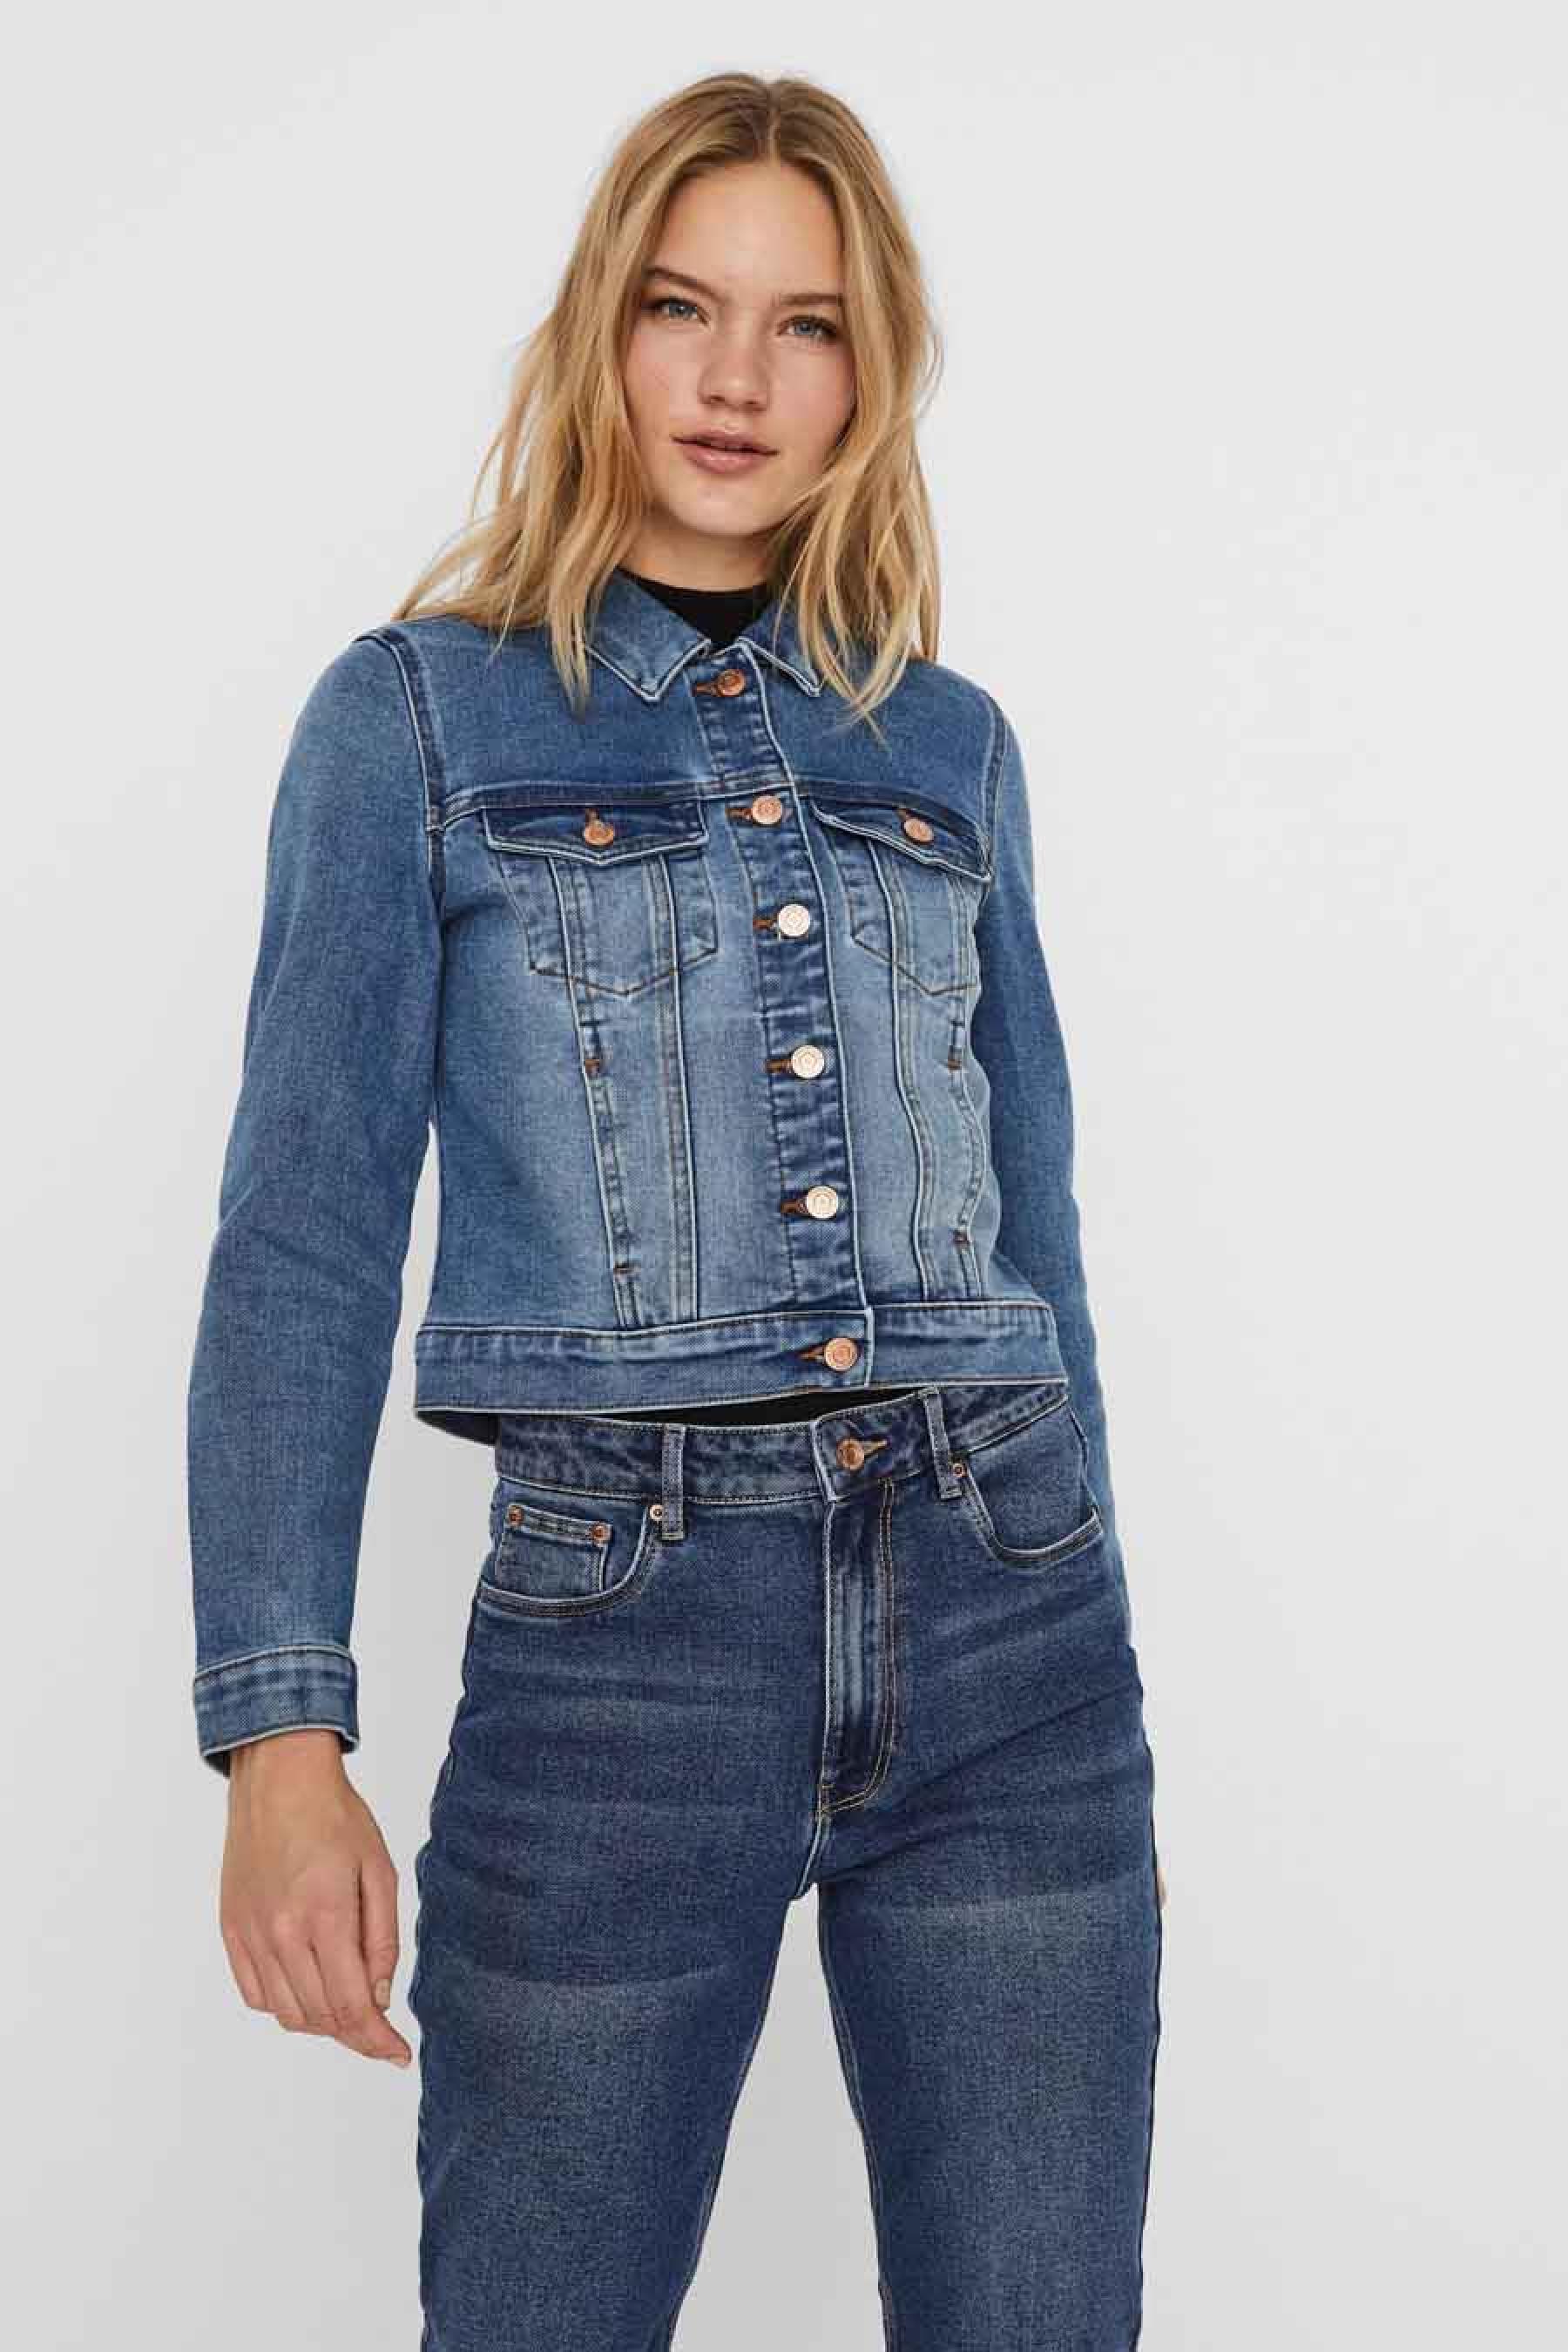 Vero Moda Jeansjas, Denim, Dames, Maat: L/M/S/XL/XS